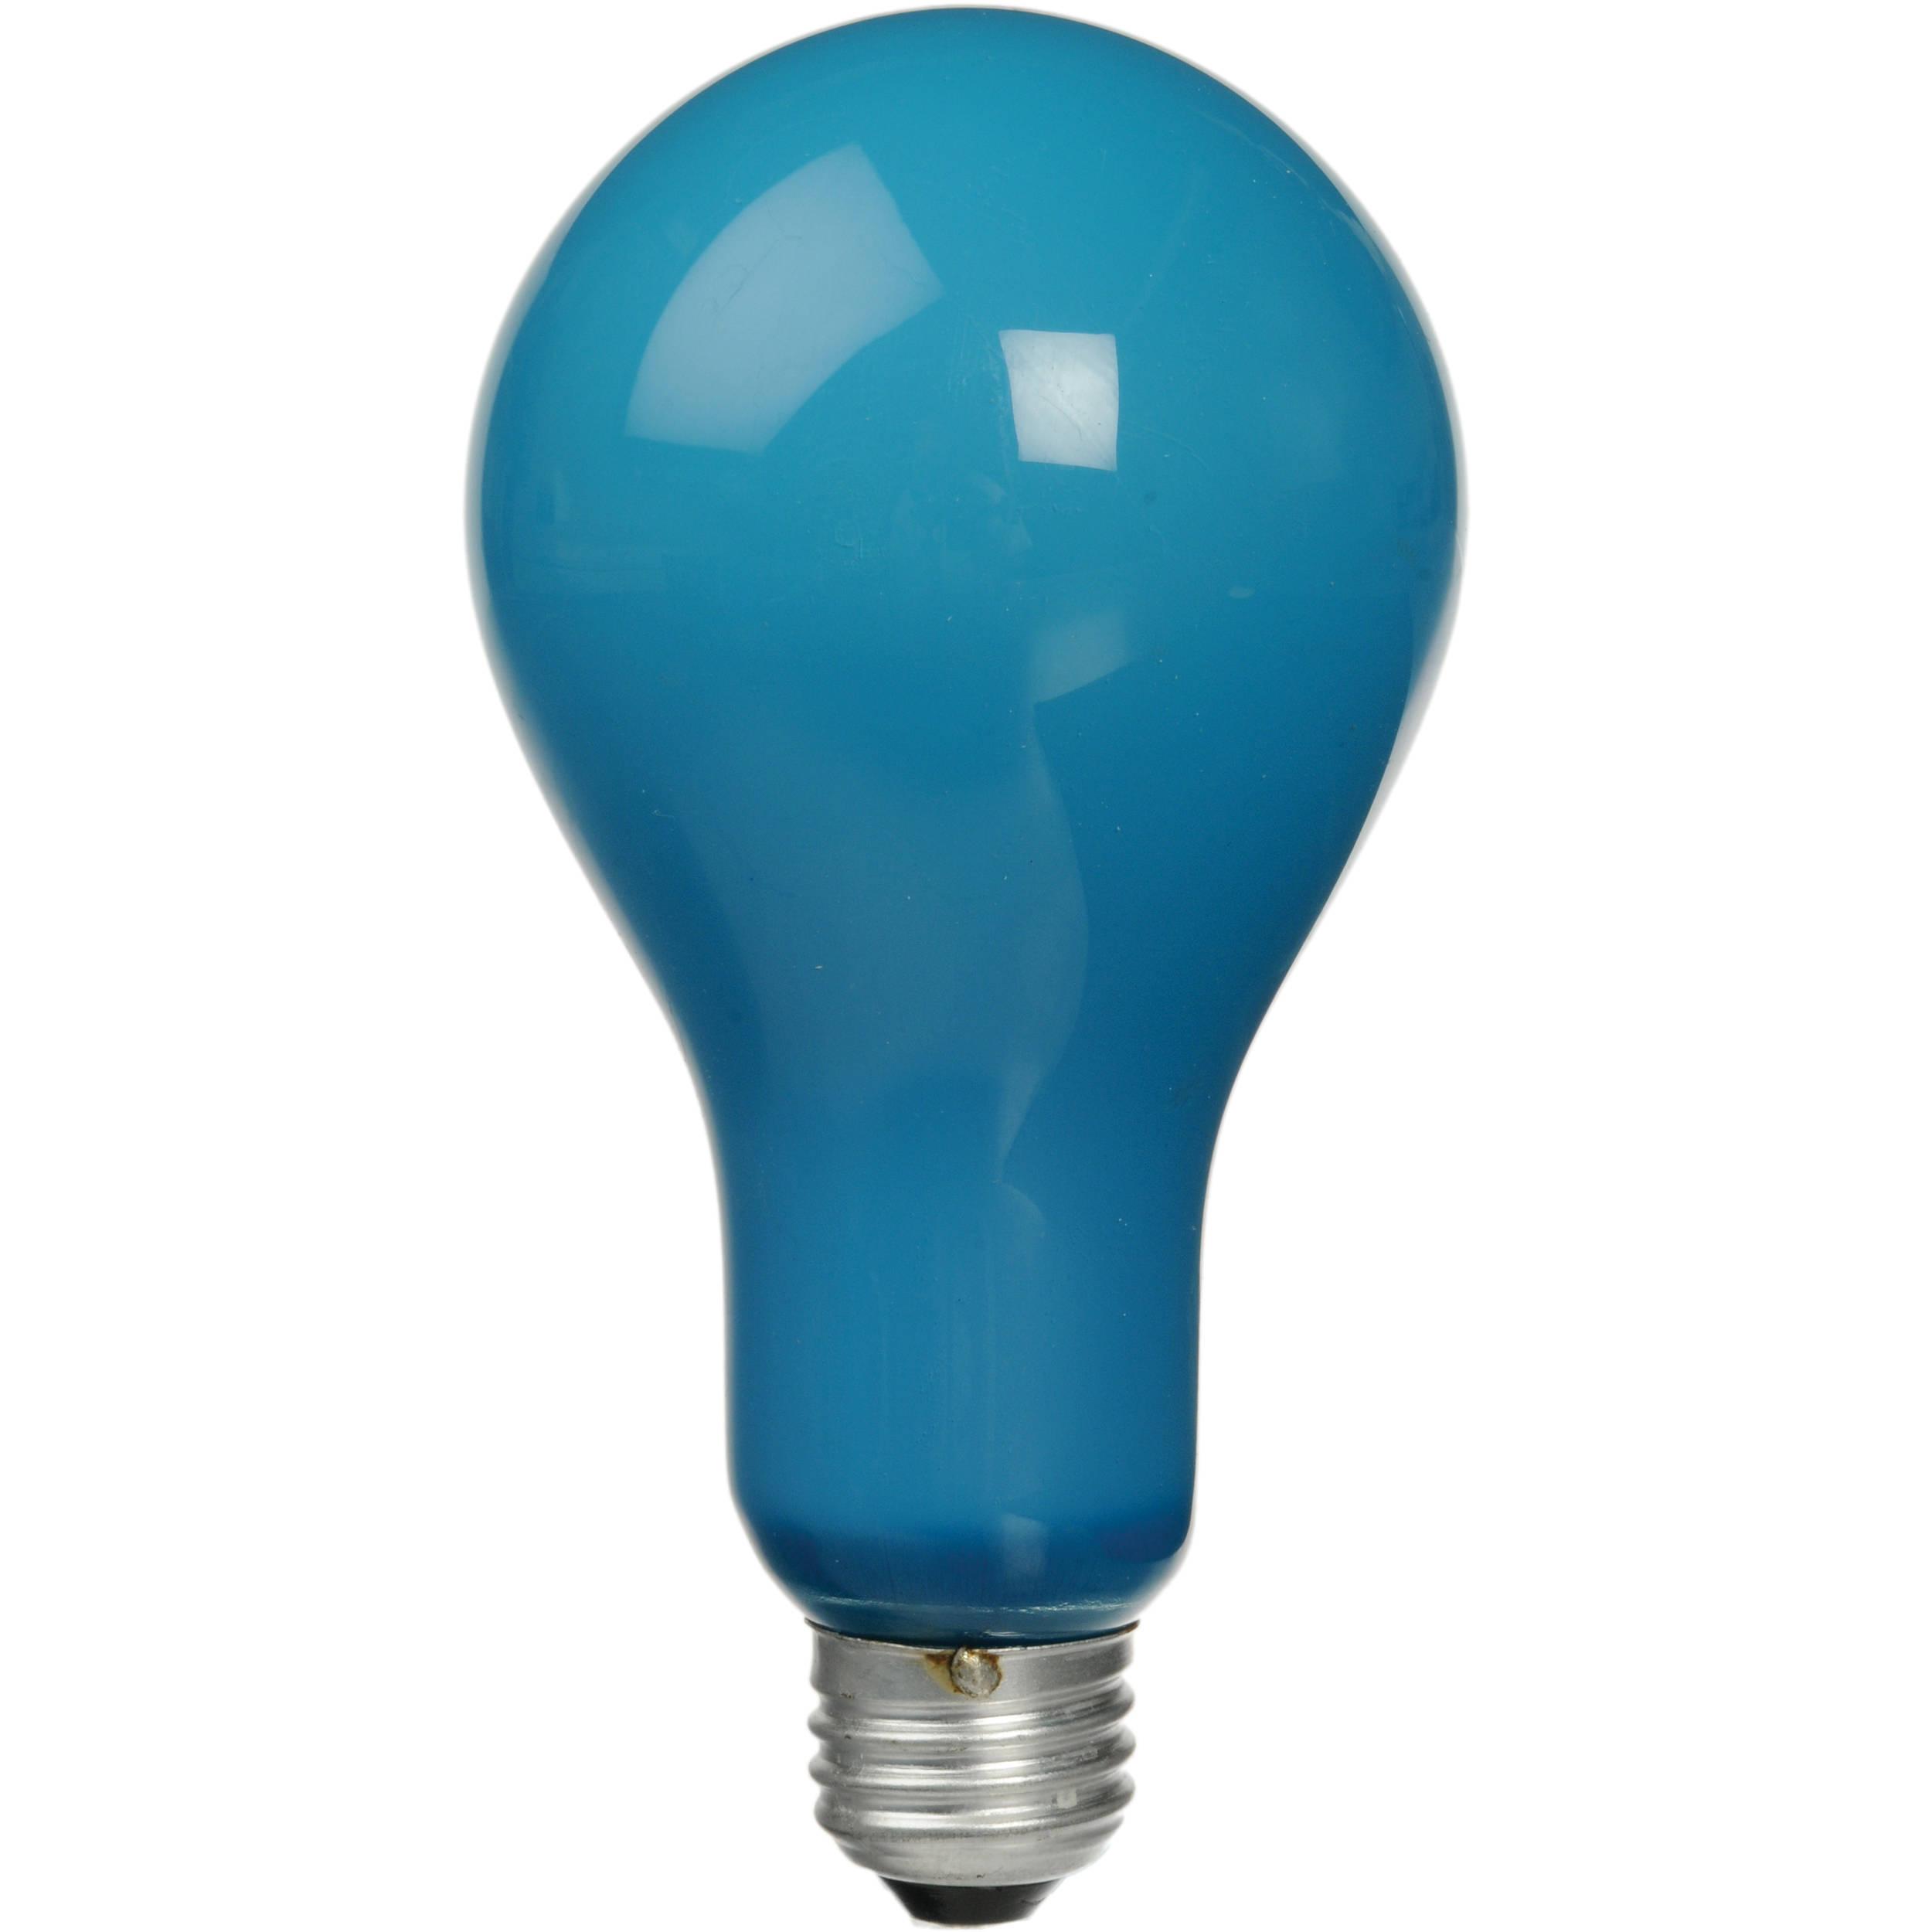 Ushio Bca Incandescent Photoflood Lamp 250w 115 120v